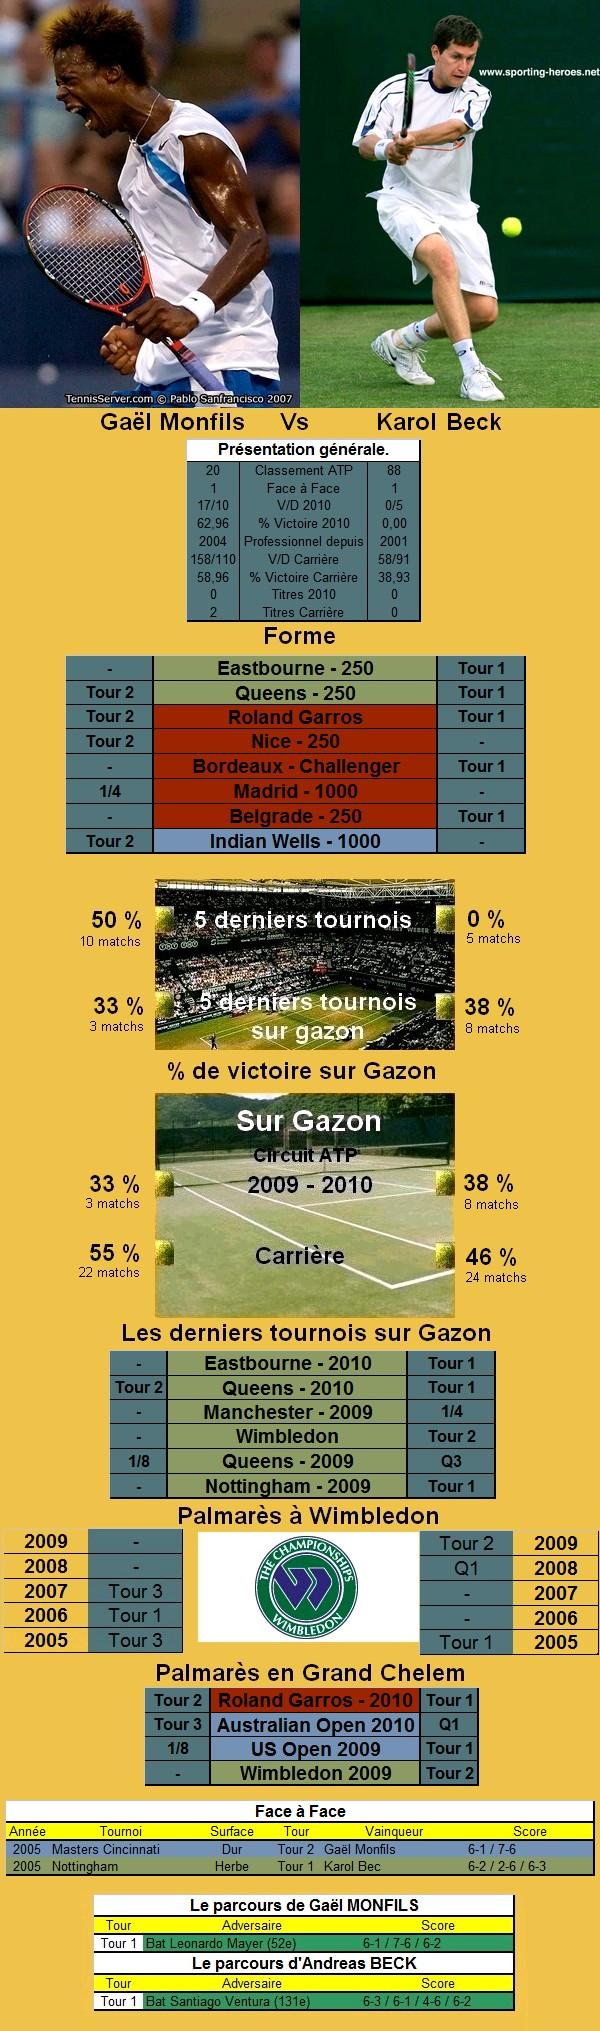 Statistiques tennis de Monfils contre Beck à Wimbledon